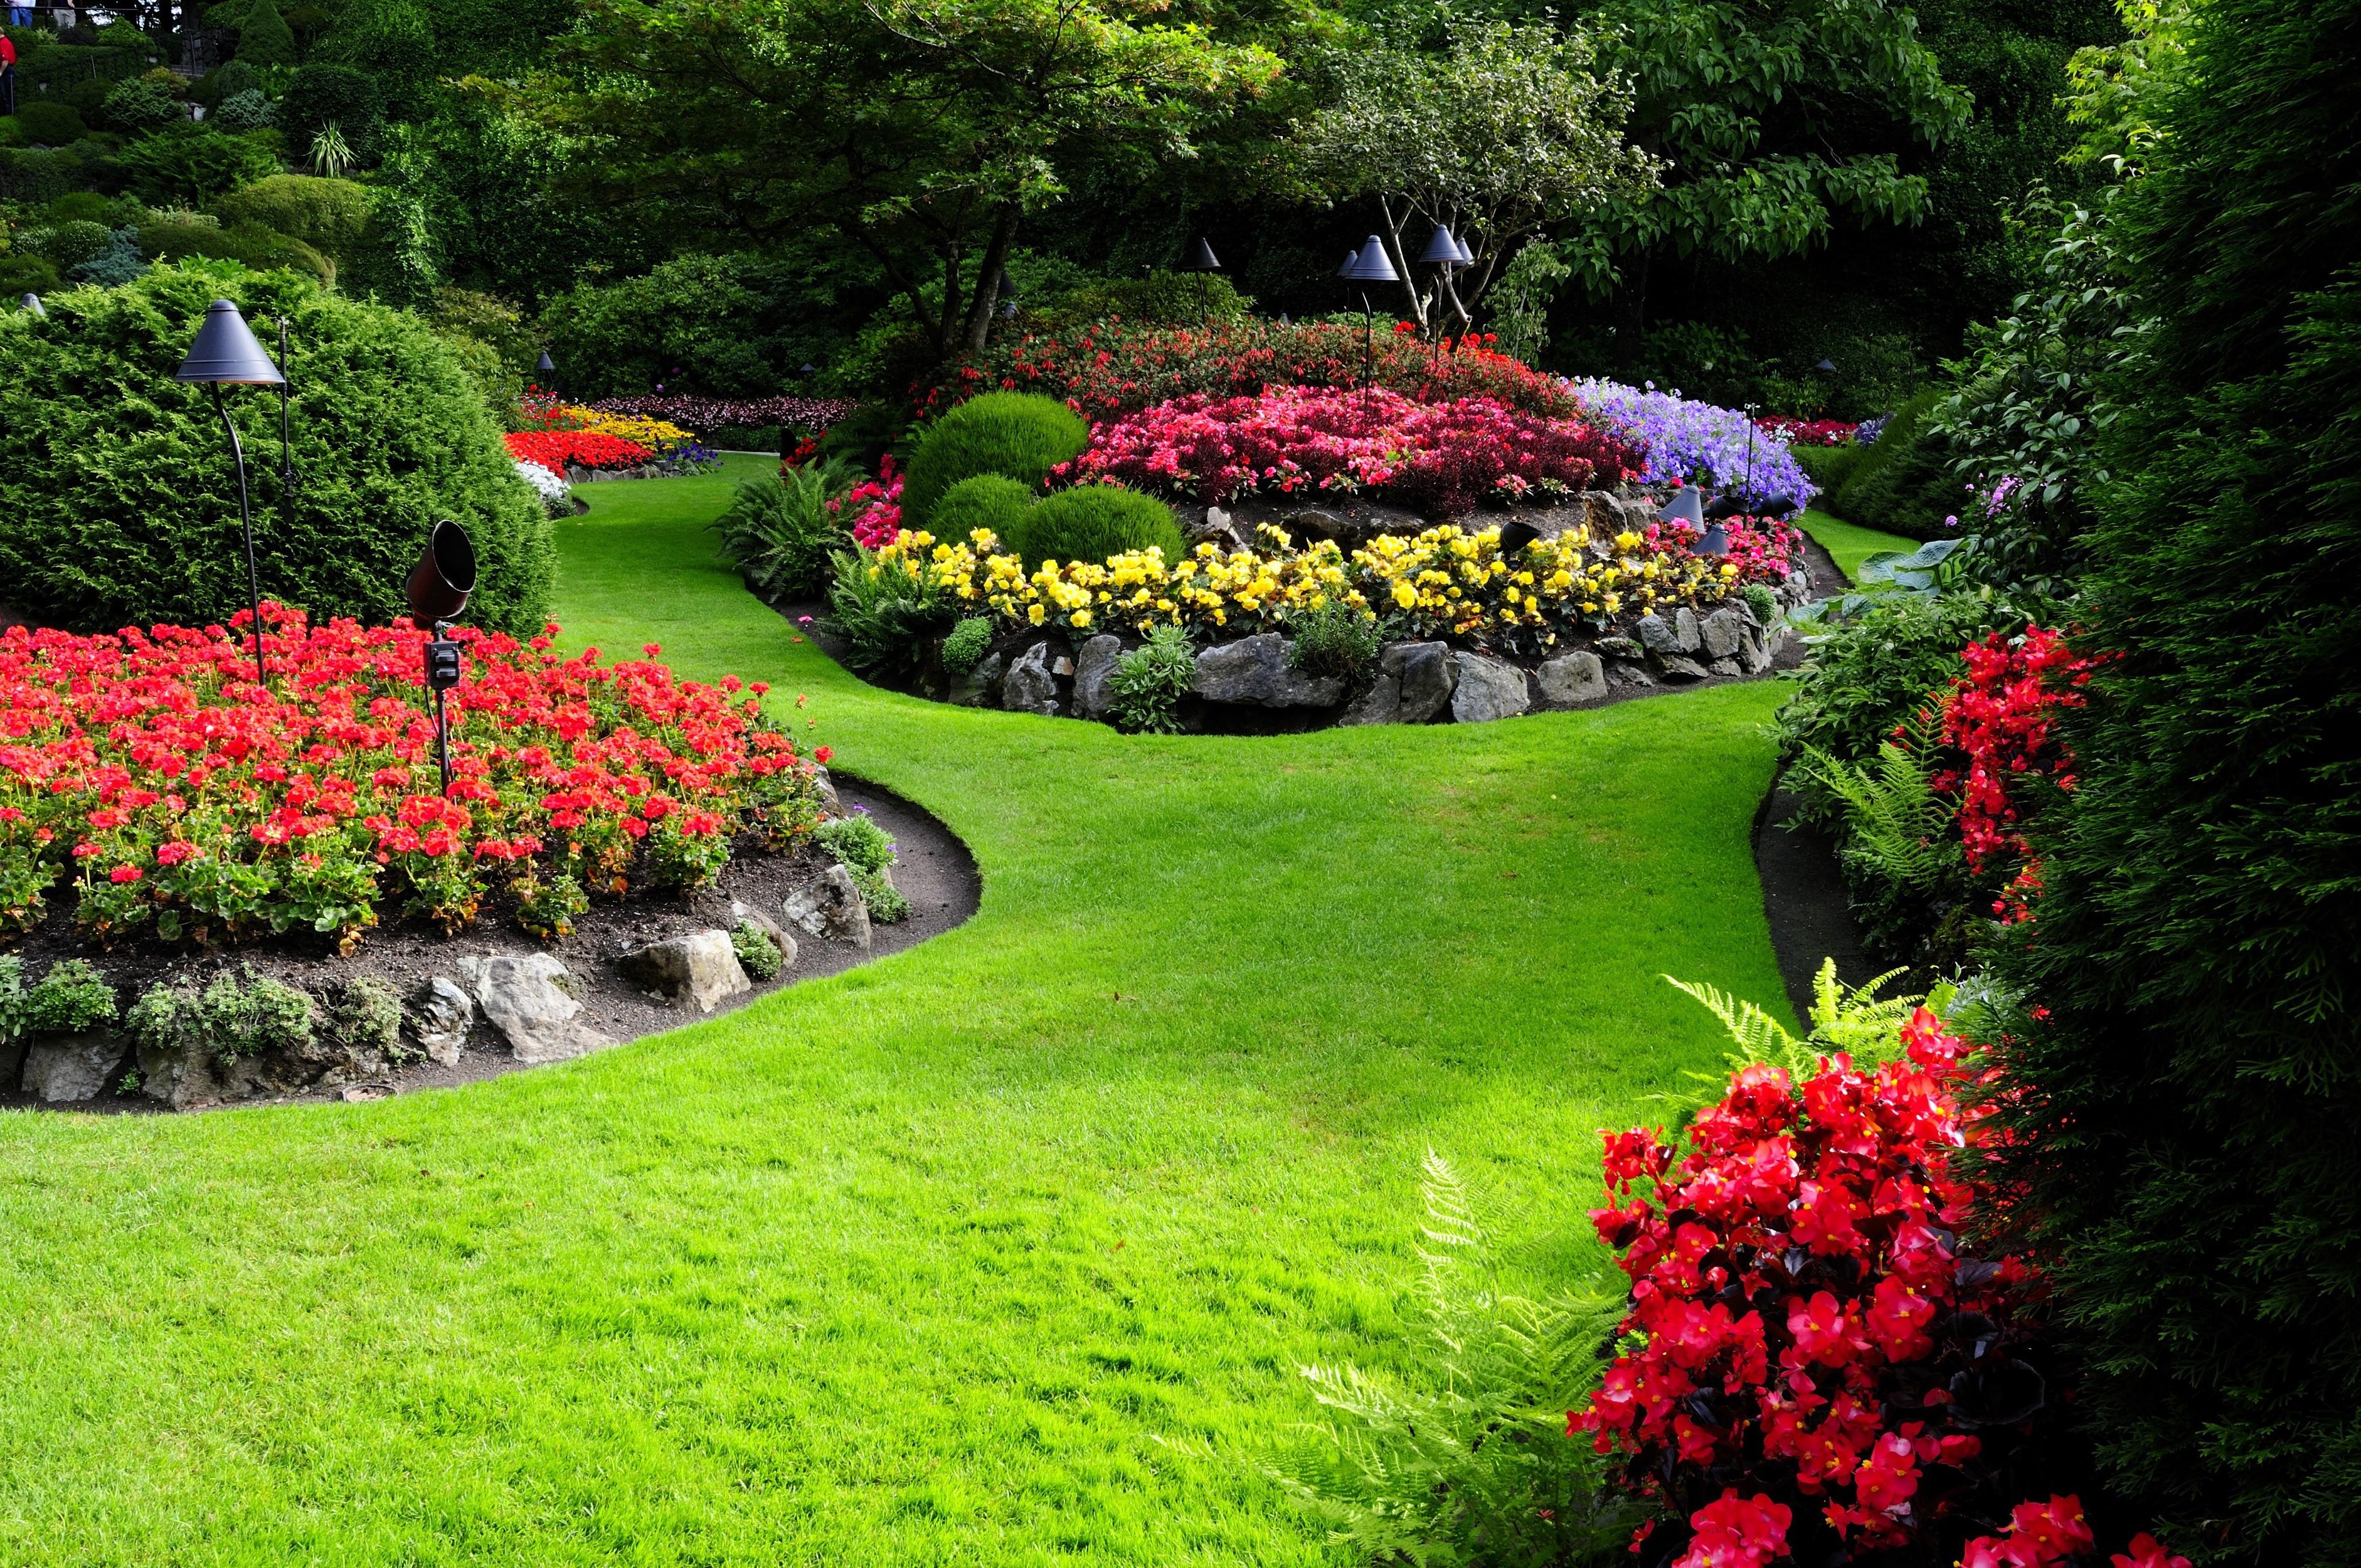 Wallpaper 3764x2500 px flowers garden landscape nature 3764x2500 px flowers garden landscape nature workwithnaturefo